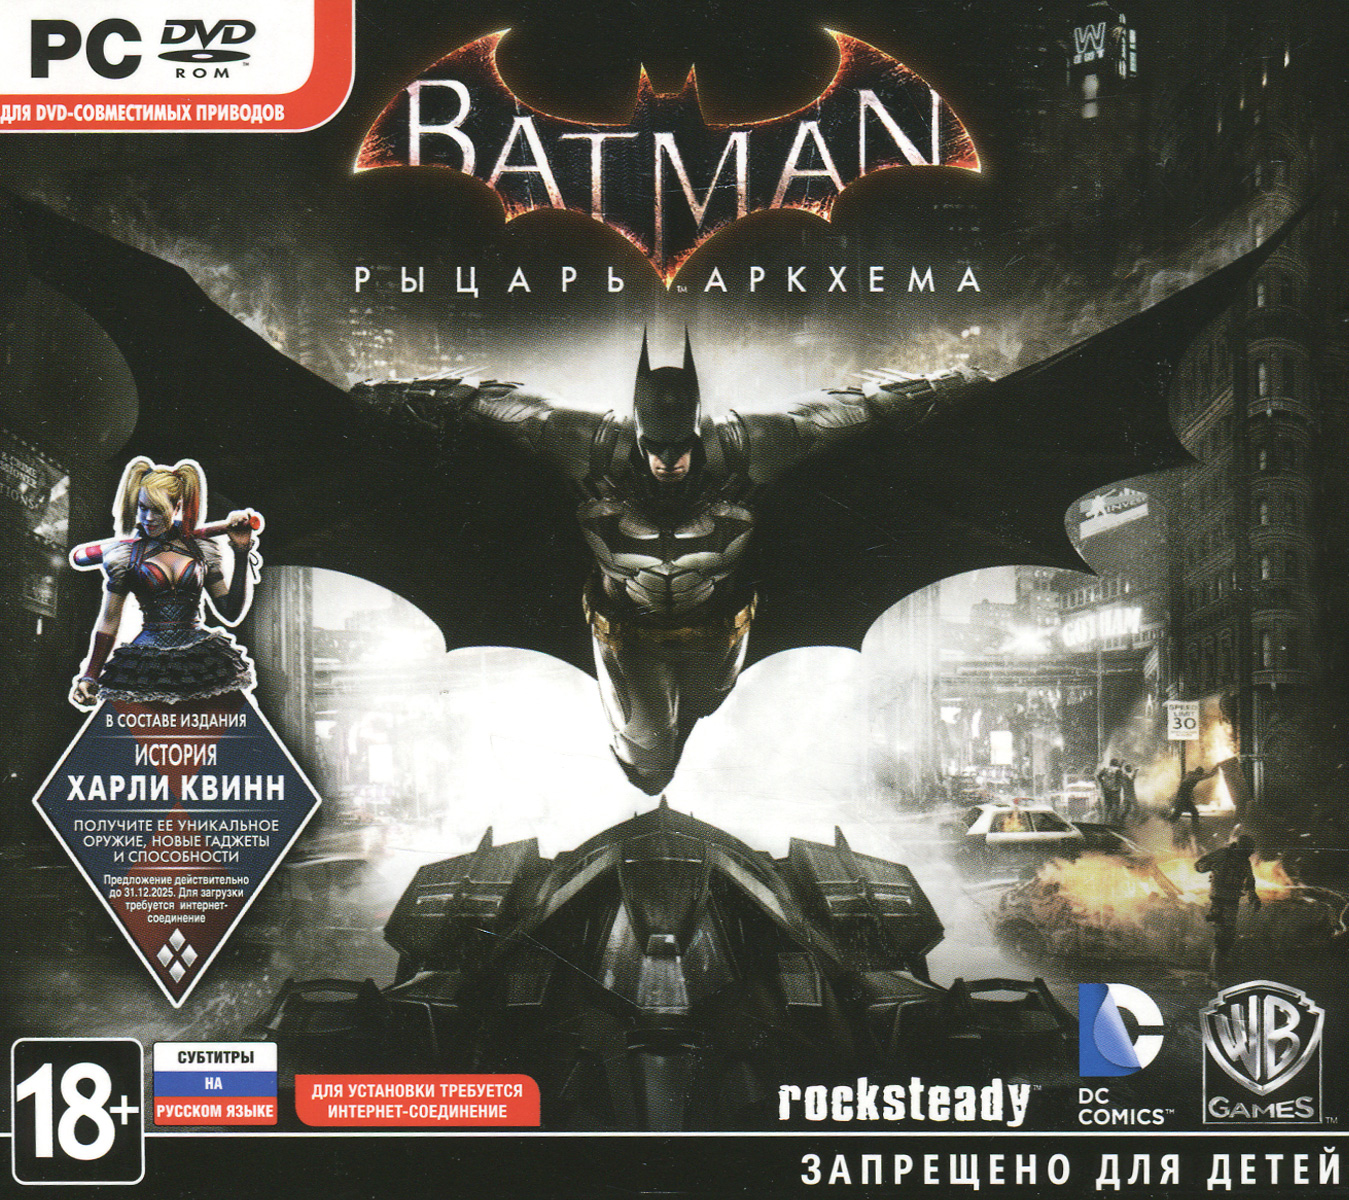 Batman: Рыцарь Аркхема (5 DVD)